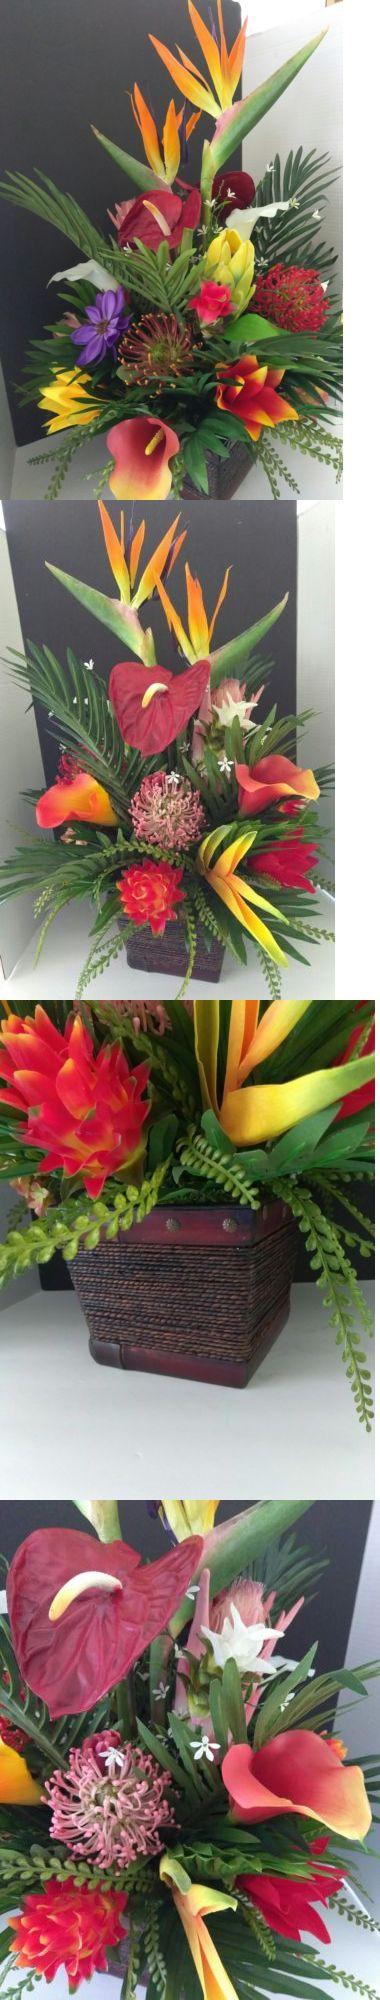 Floral D cor 4959: Tropical Silk Flower Floral Arrangement, Hotel Office Decor -> BUY IT NOW ONLY: $135.95 on eBay!